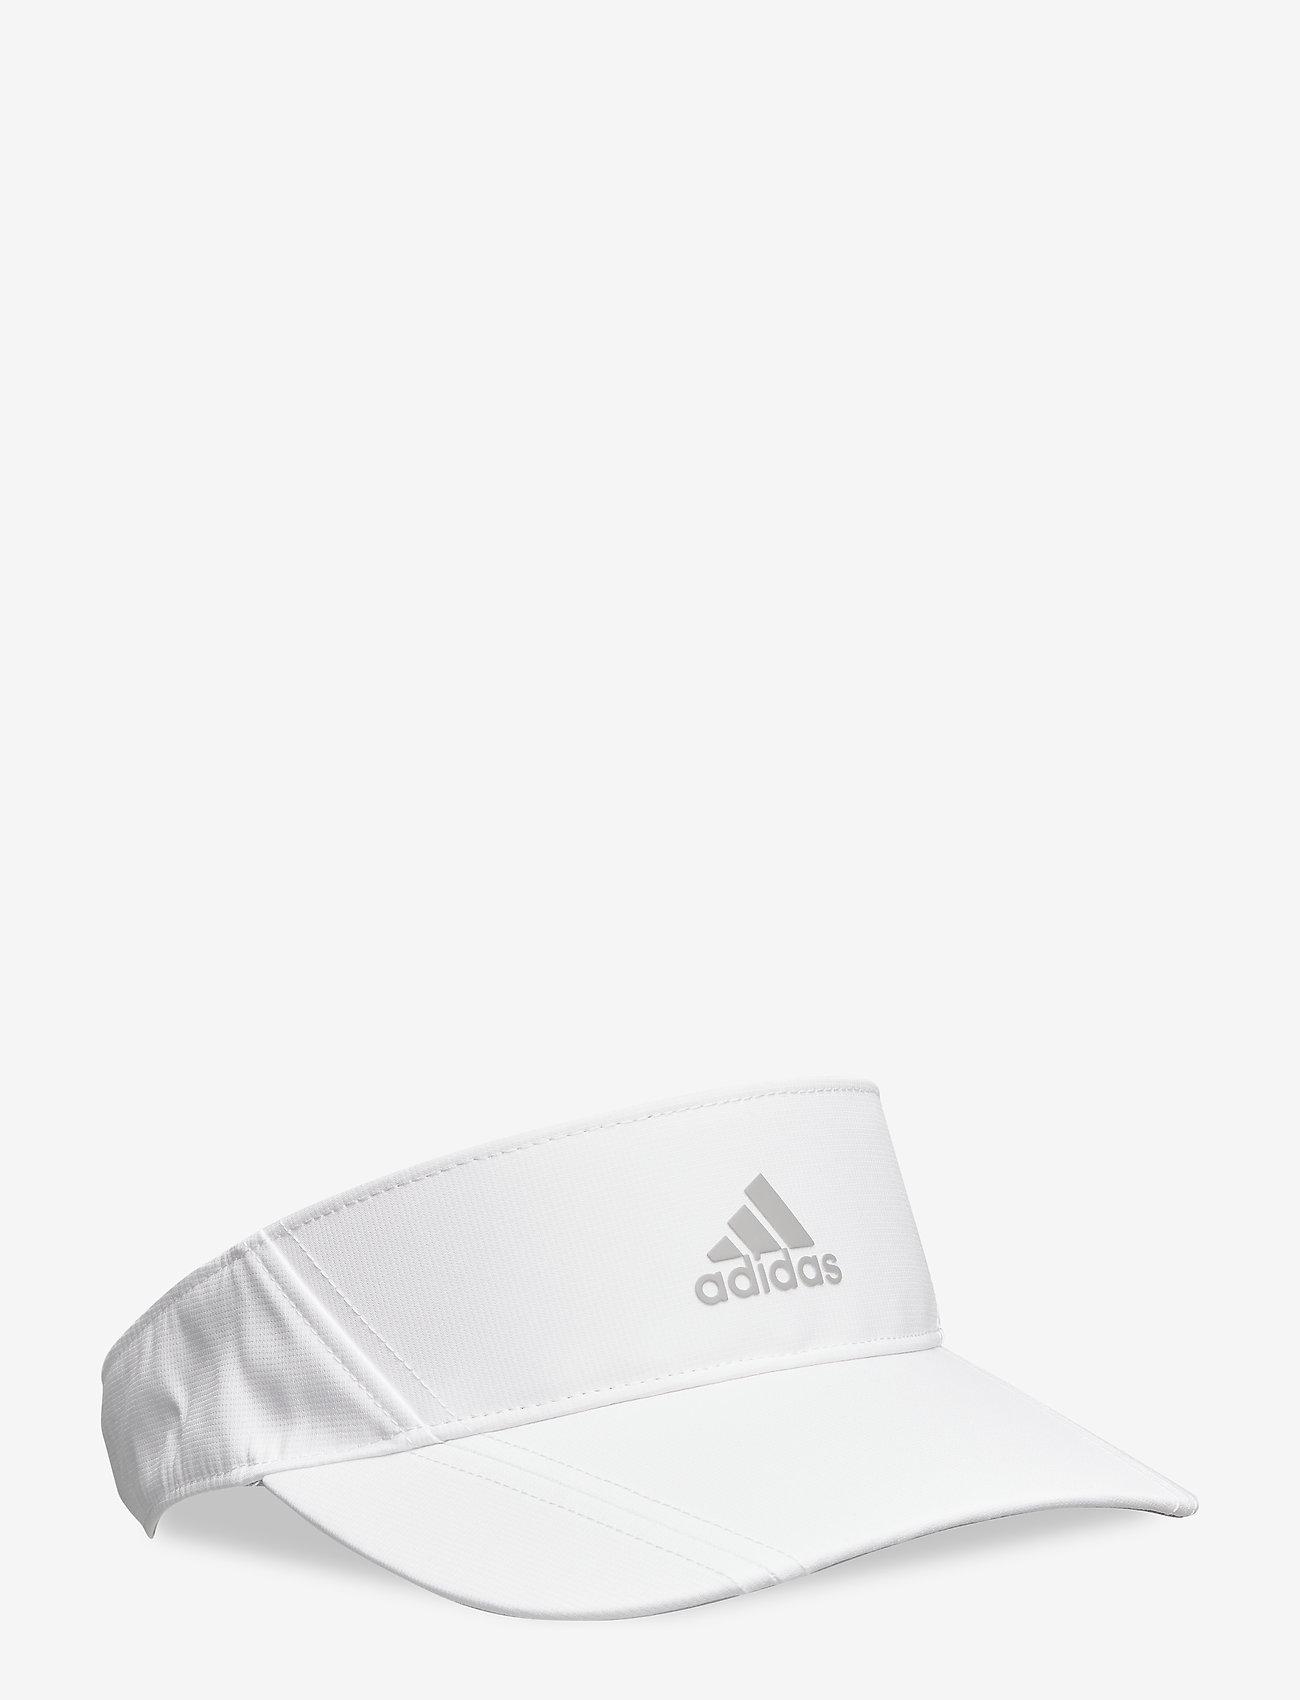 adidas Golf - W CMFRT VSR - caps - white - 0